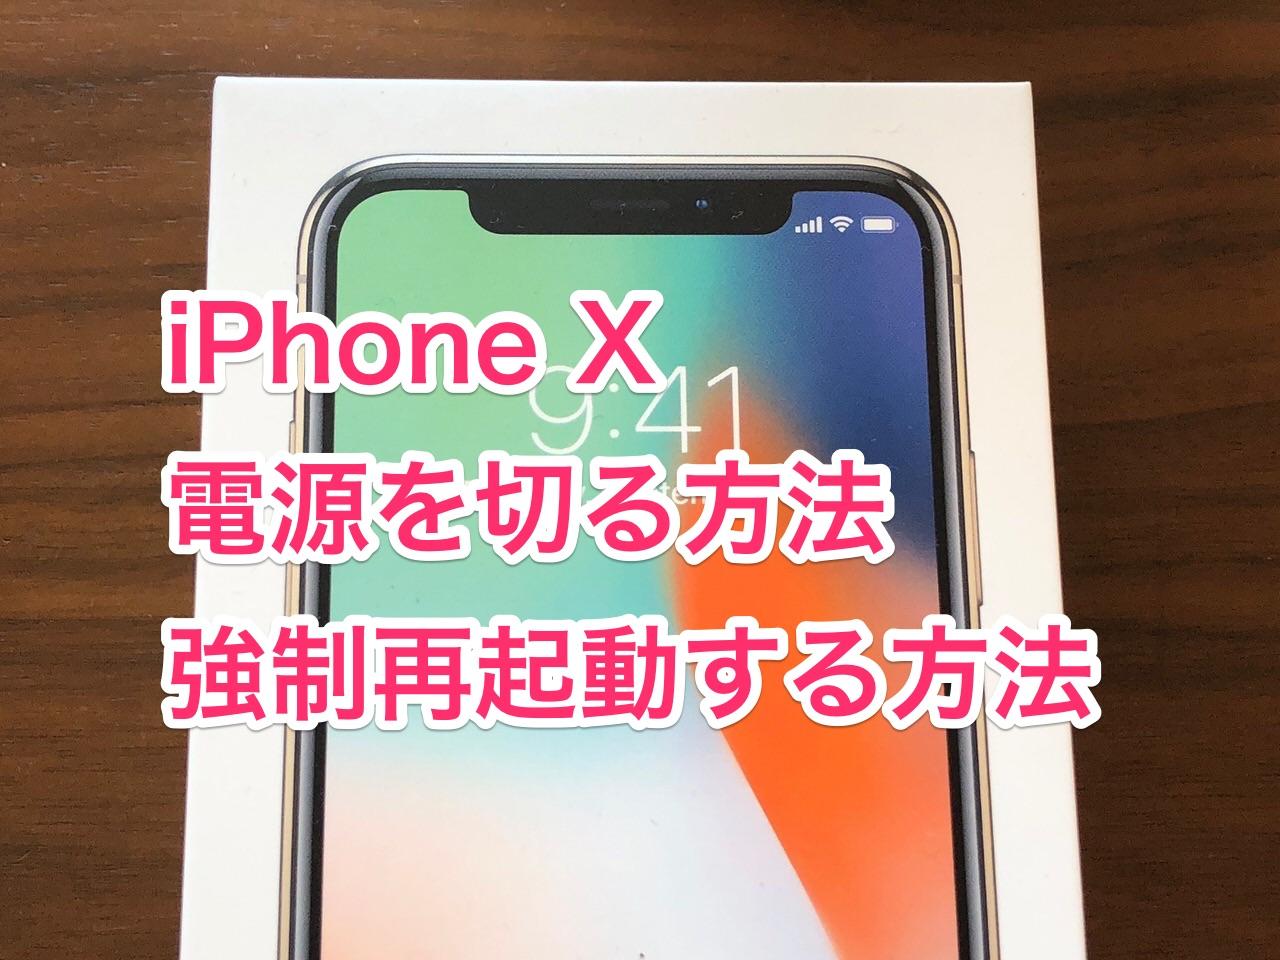 【iPhone X】電源を切る方法・強制再起動する方法